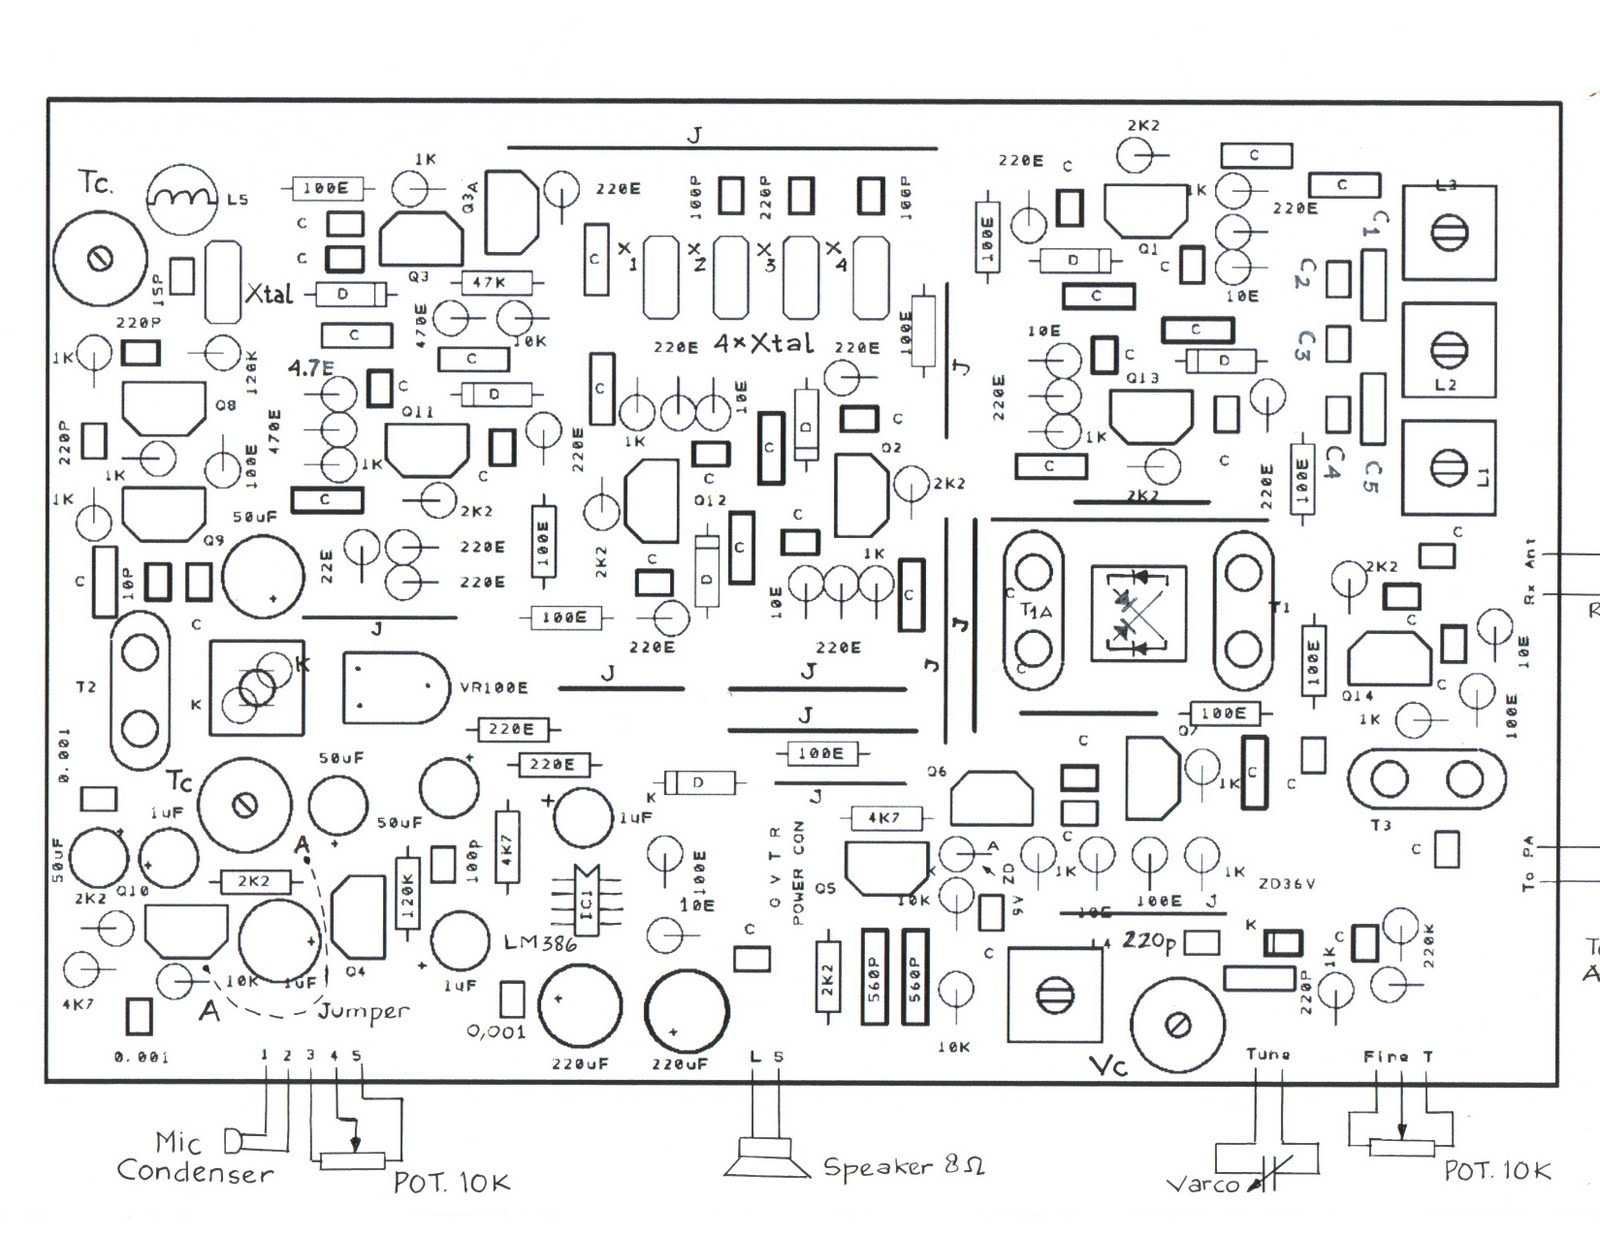 kenwood ez500 wiring harness wiring diagram specialtieskenwood kdc 610u wiring harnes wiring diagram databasea wiring harness [ 1600 x 1236 Pixel ]